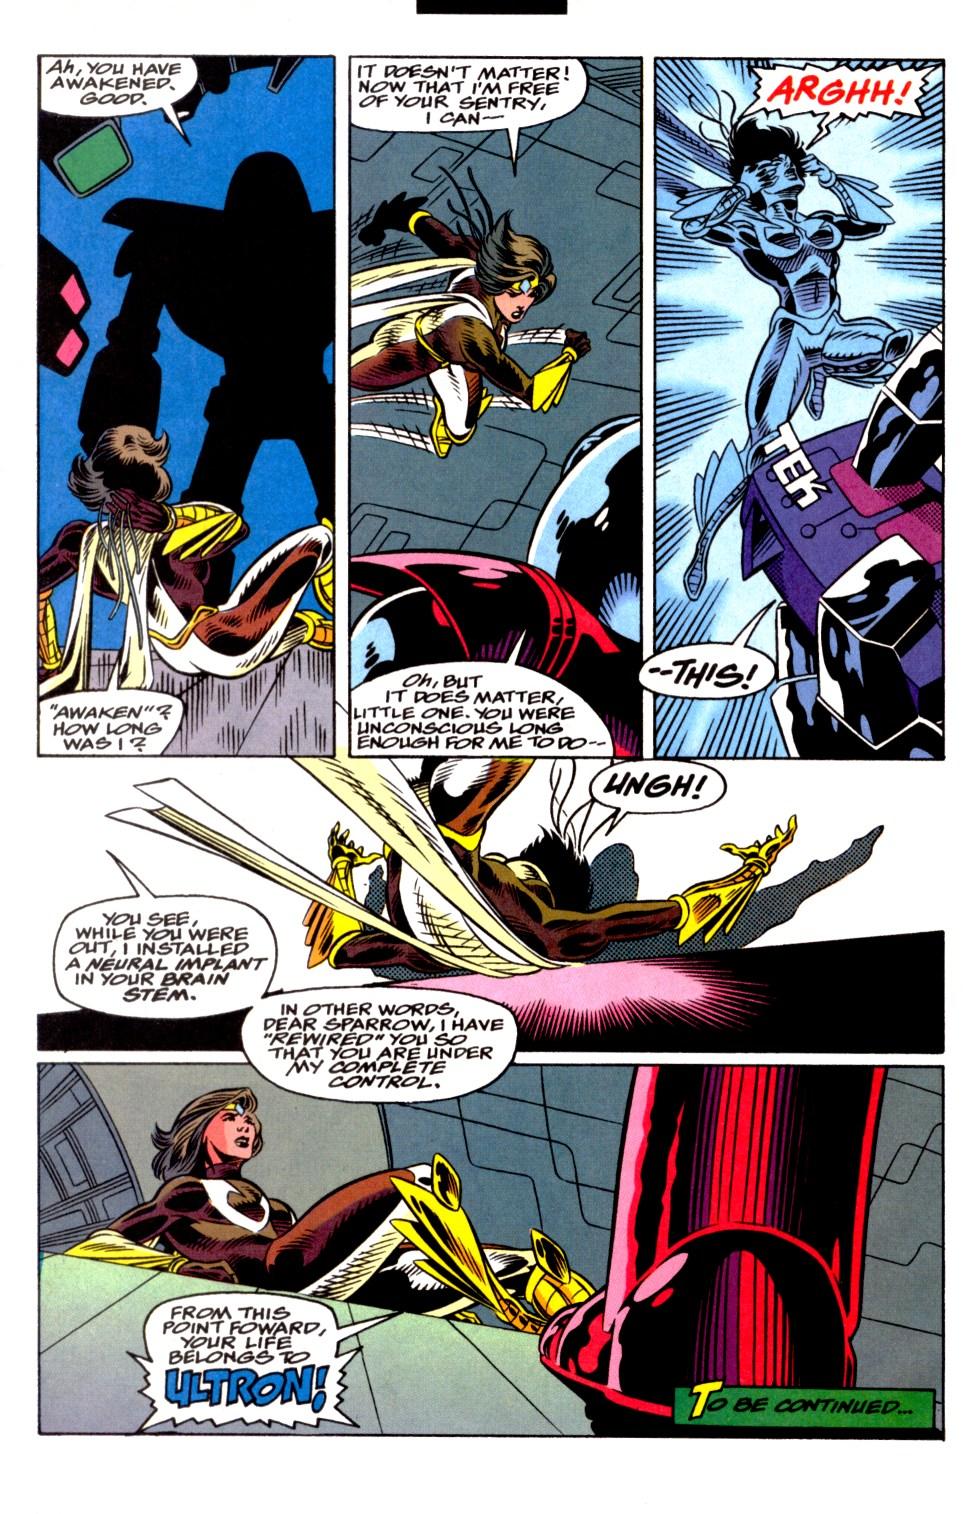 Read online Blackwulf comic -  Issue #4 - 23